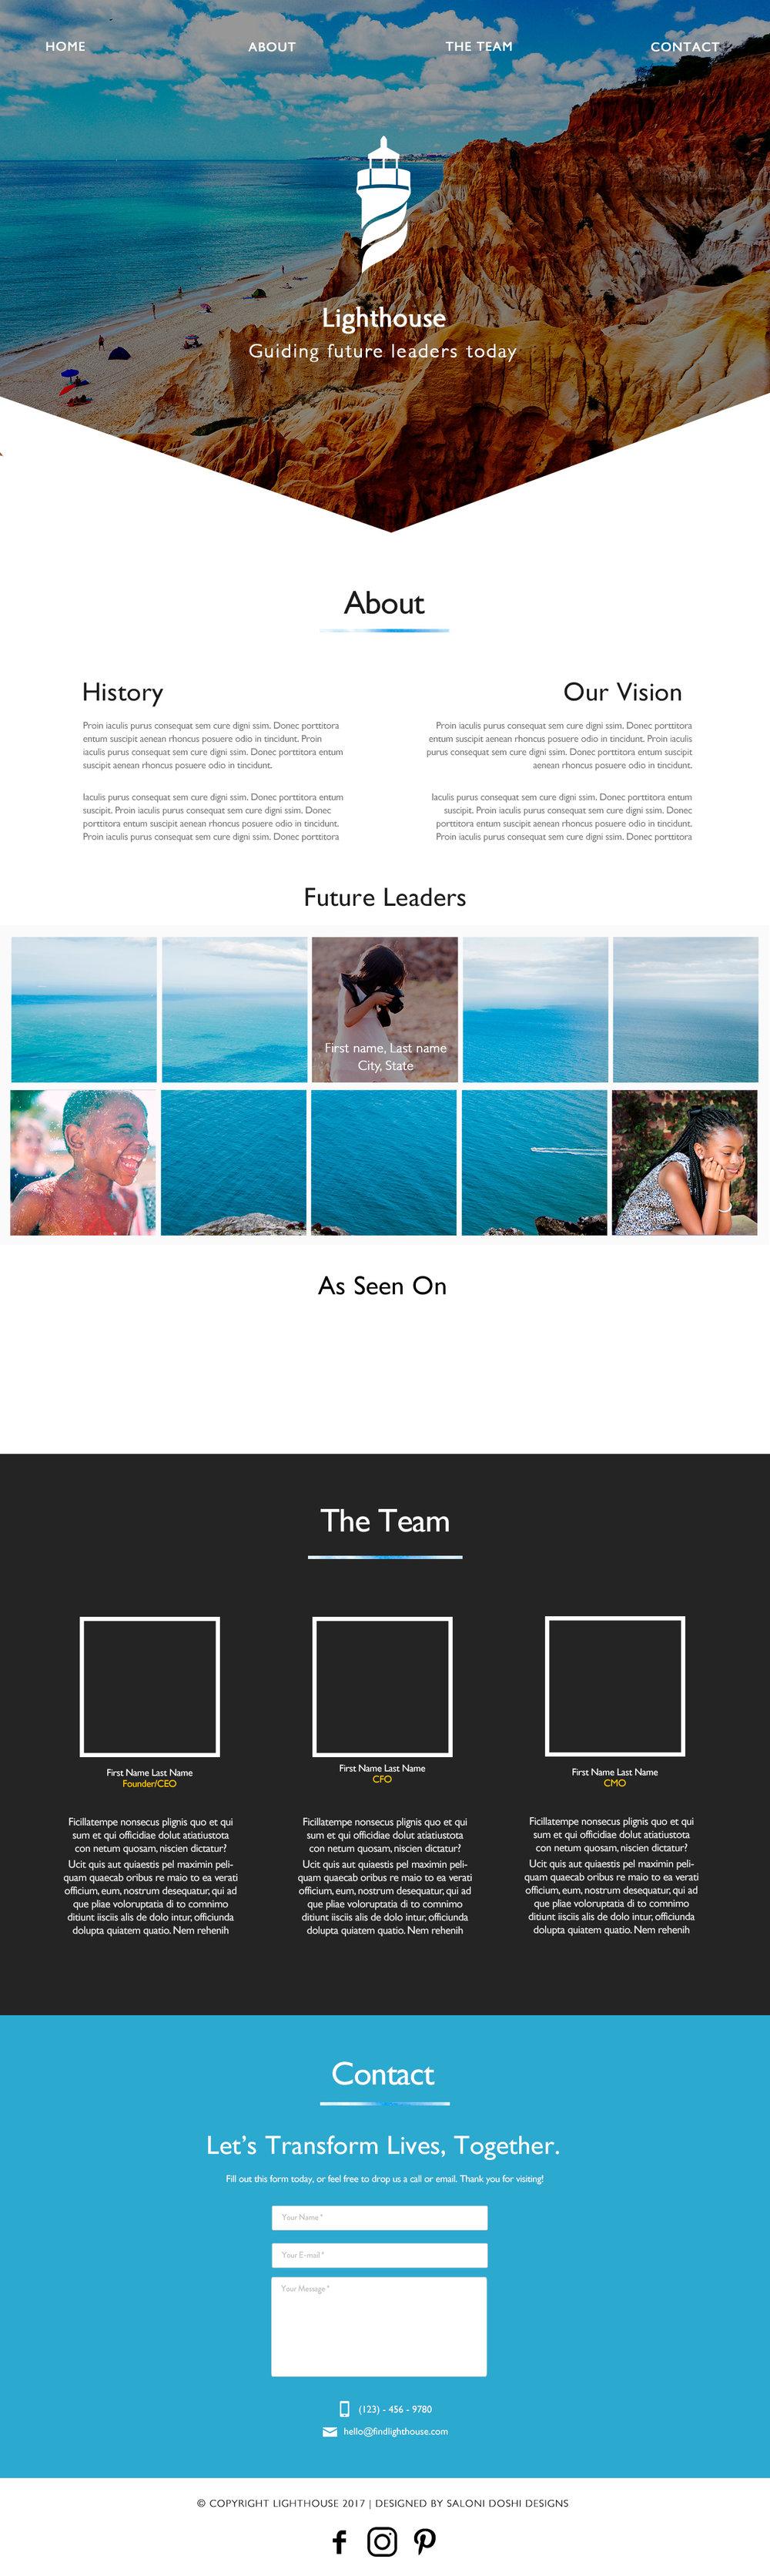 Behance_Lighthouse_SaloniDoshiDesigns_websitedesign.jpg